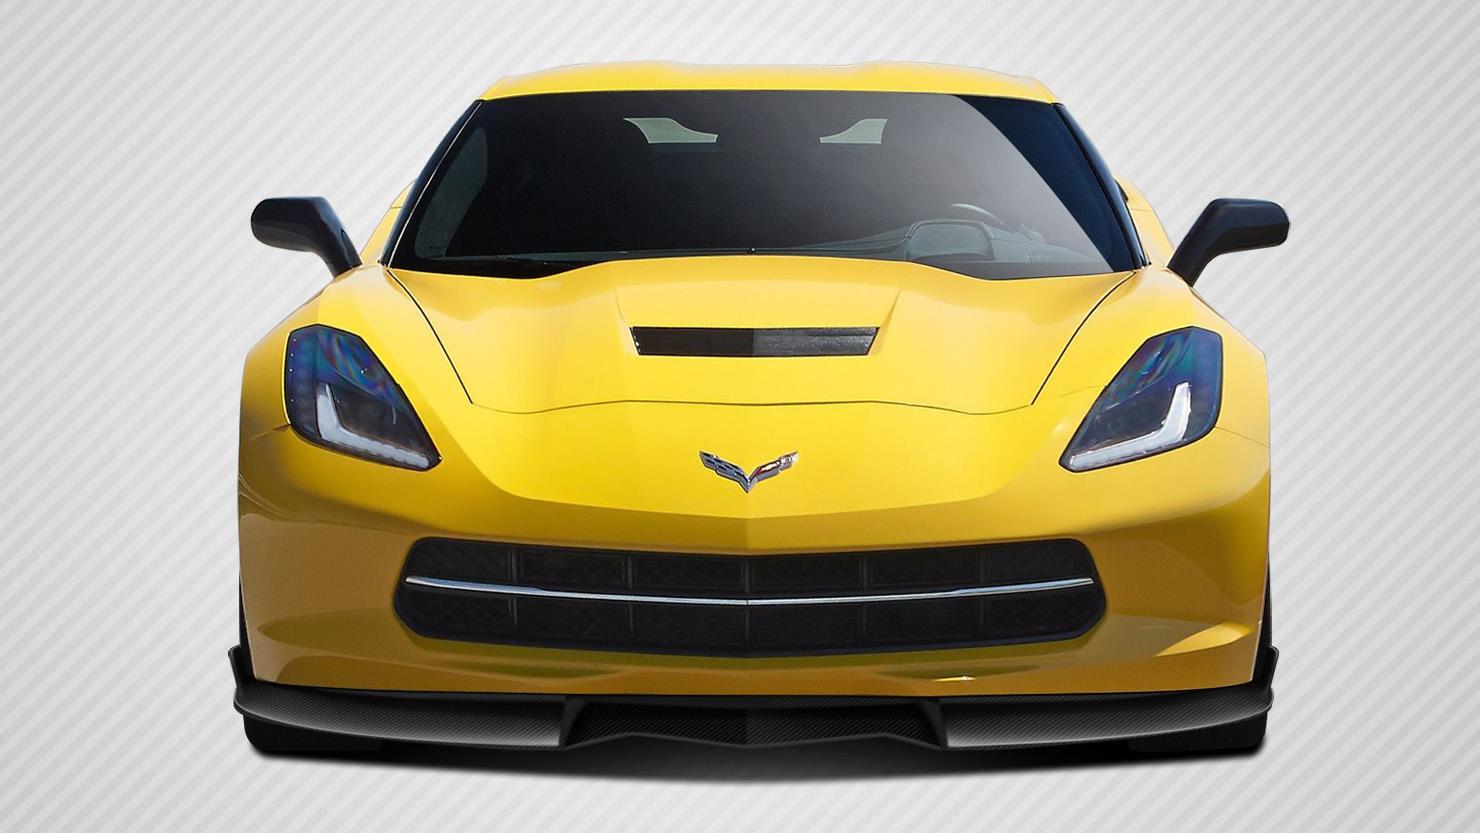 Front Lip/Add On Bodykit for 2016 Chevrolet Corvette ALL - Chevrolet Corvette C7 Carbon Creations GT Concept Front Lip Under Air Dam Spoiler - 1 Piece